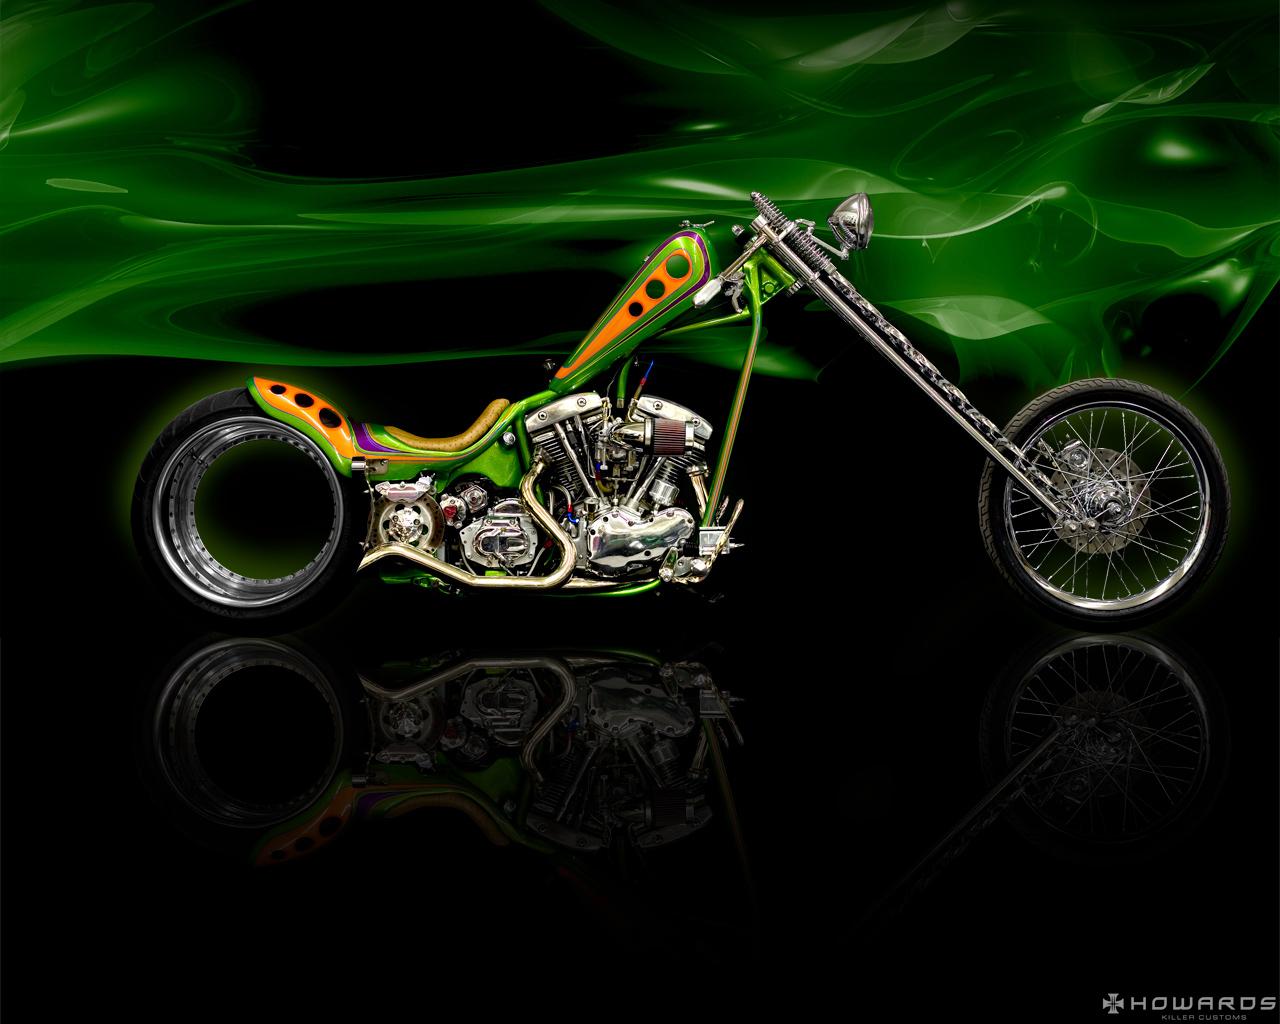 Harley Davidson Chopper Bike